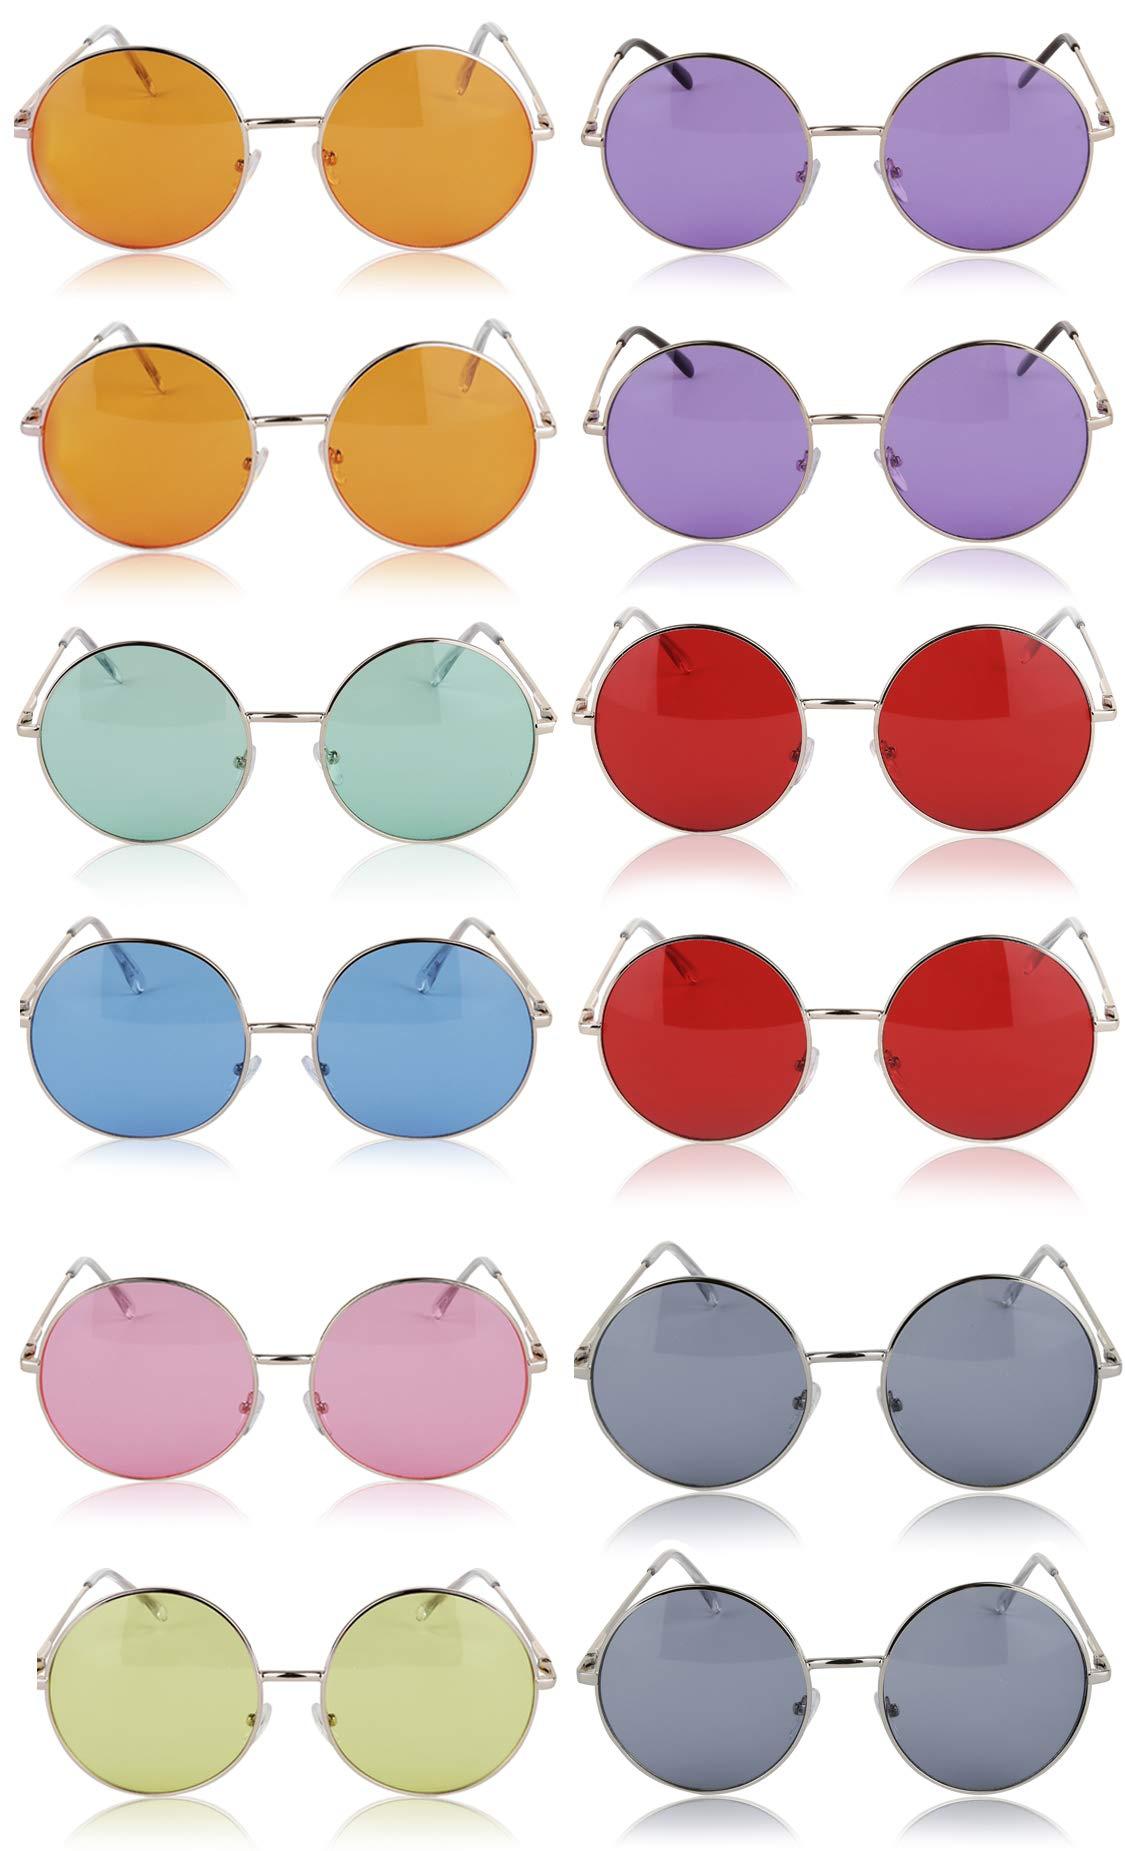 Sunny Pro Round Sunglasses Retro Circle Tinted Lens Glasses UV400 Protection (12 pack)